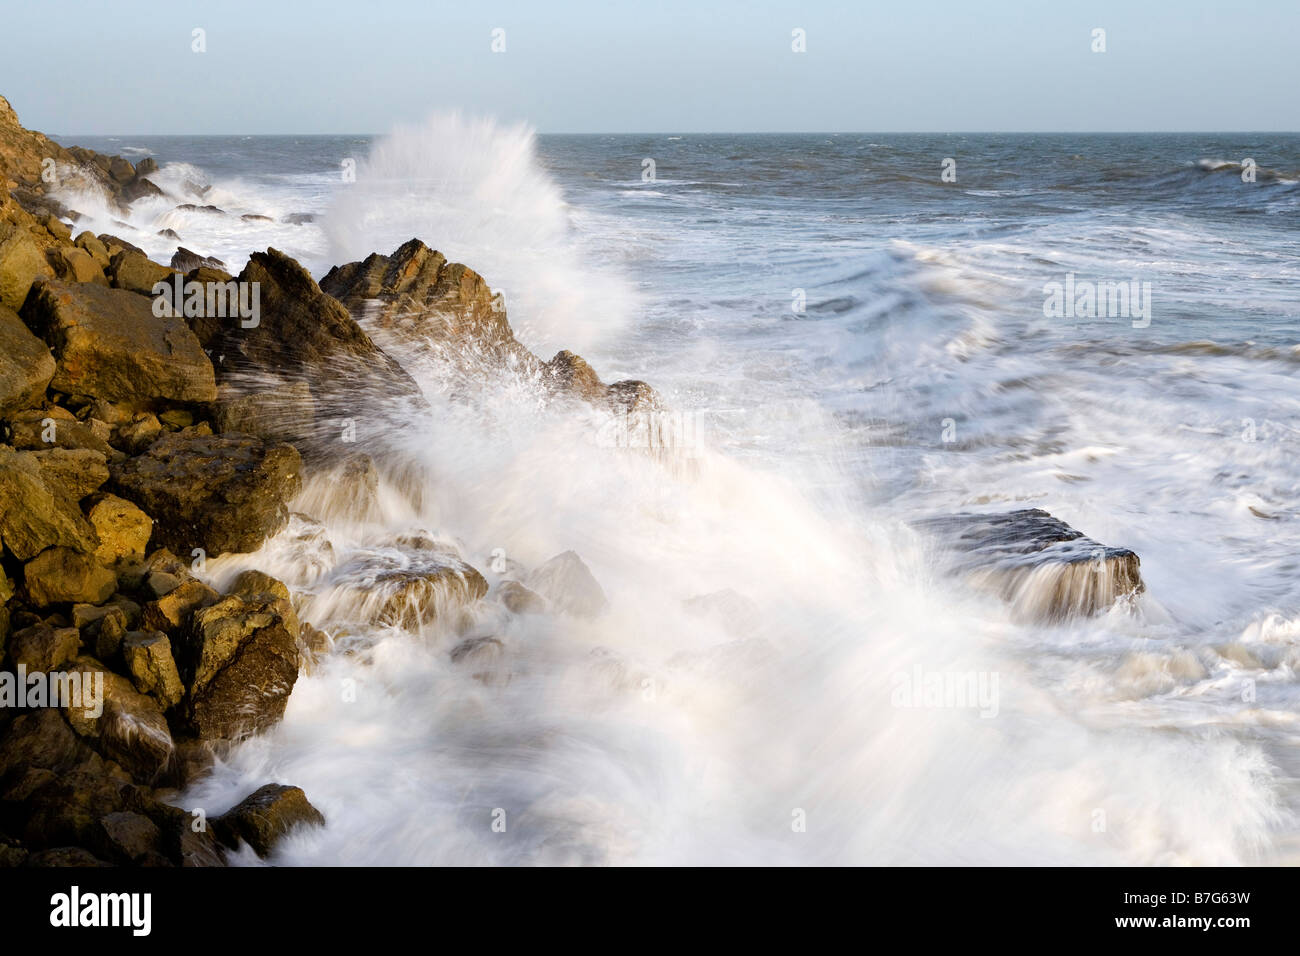 Rough seas crashing against rocks - Stock Image